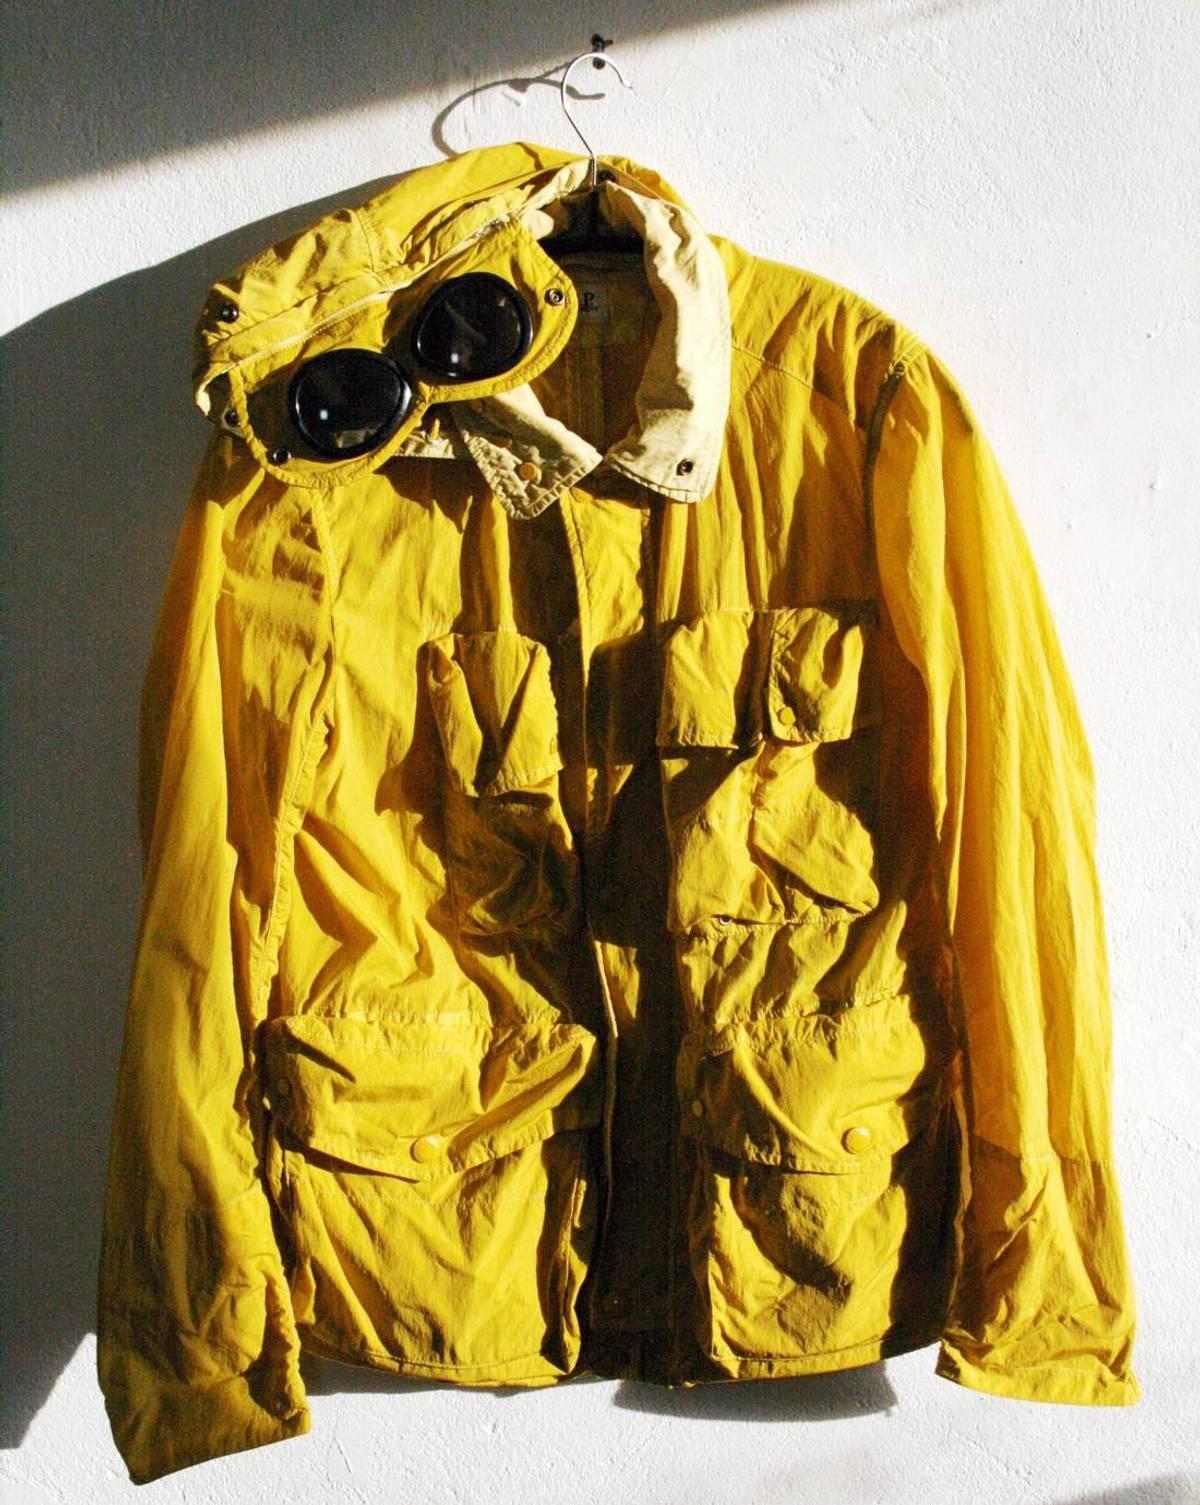 the latest 3b3bd a093e C.P. Company C.P. Company Millie Miglia Jacket 46 It S Size M Yellow Color  Race Bike Stone Island Spw Designer Item Italy Massimo Osti Rare Summer ...